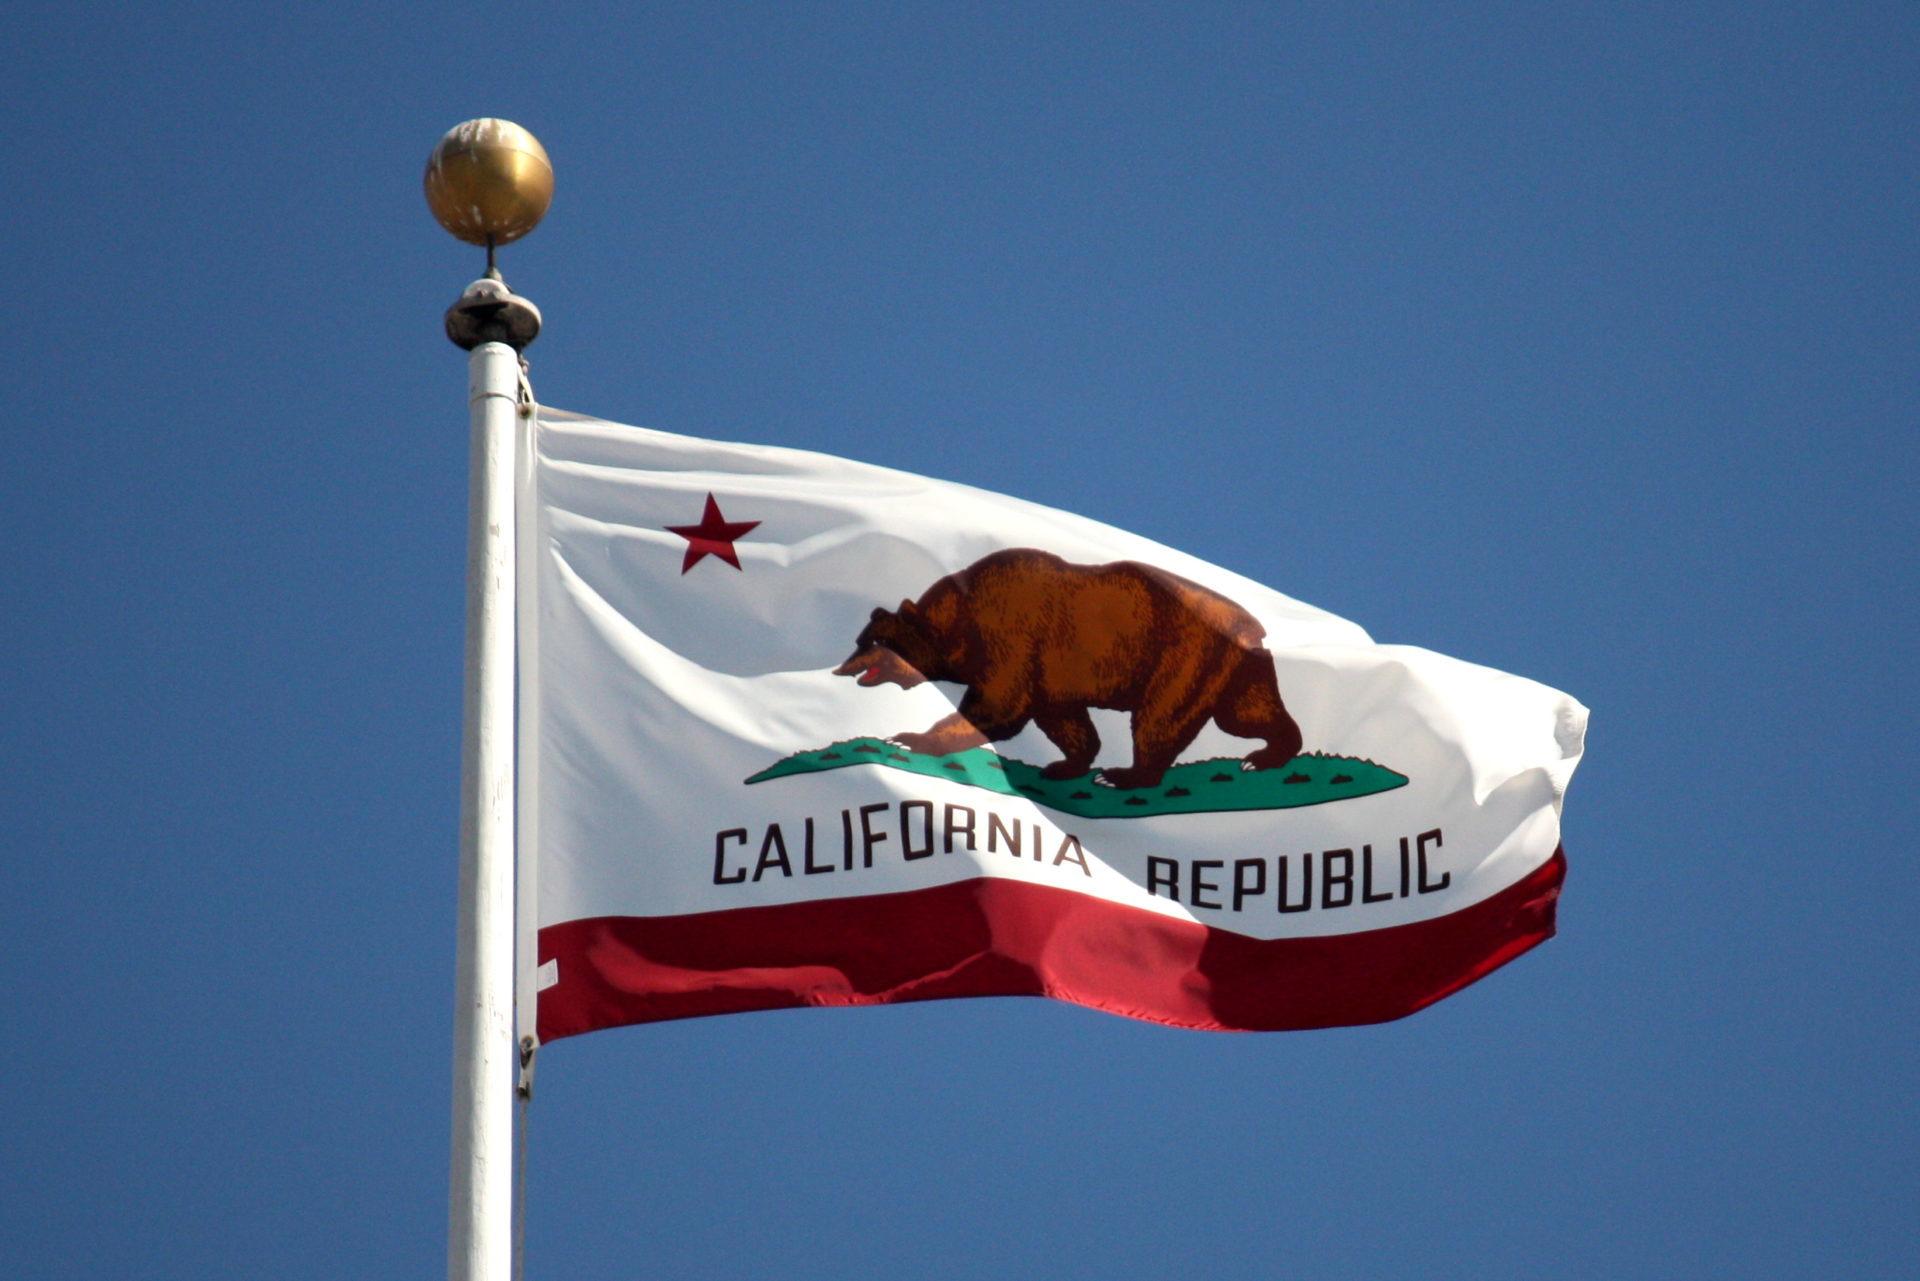 California Legislators Have Been Working to Send Blockchain Legislation For Governor's Approval